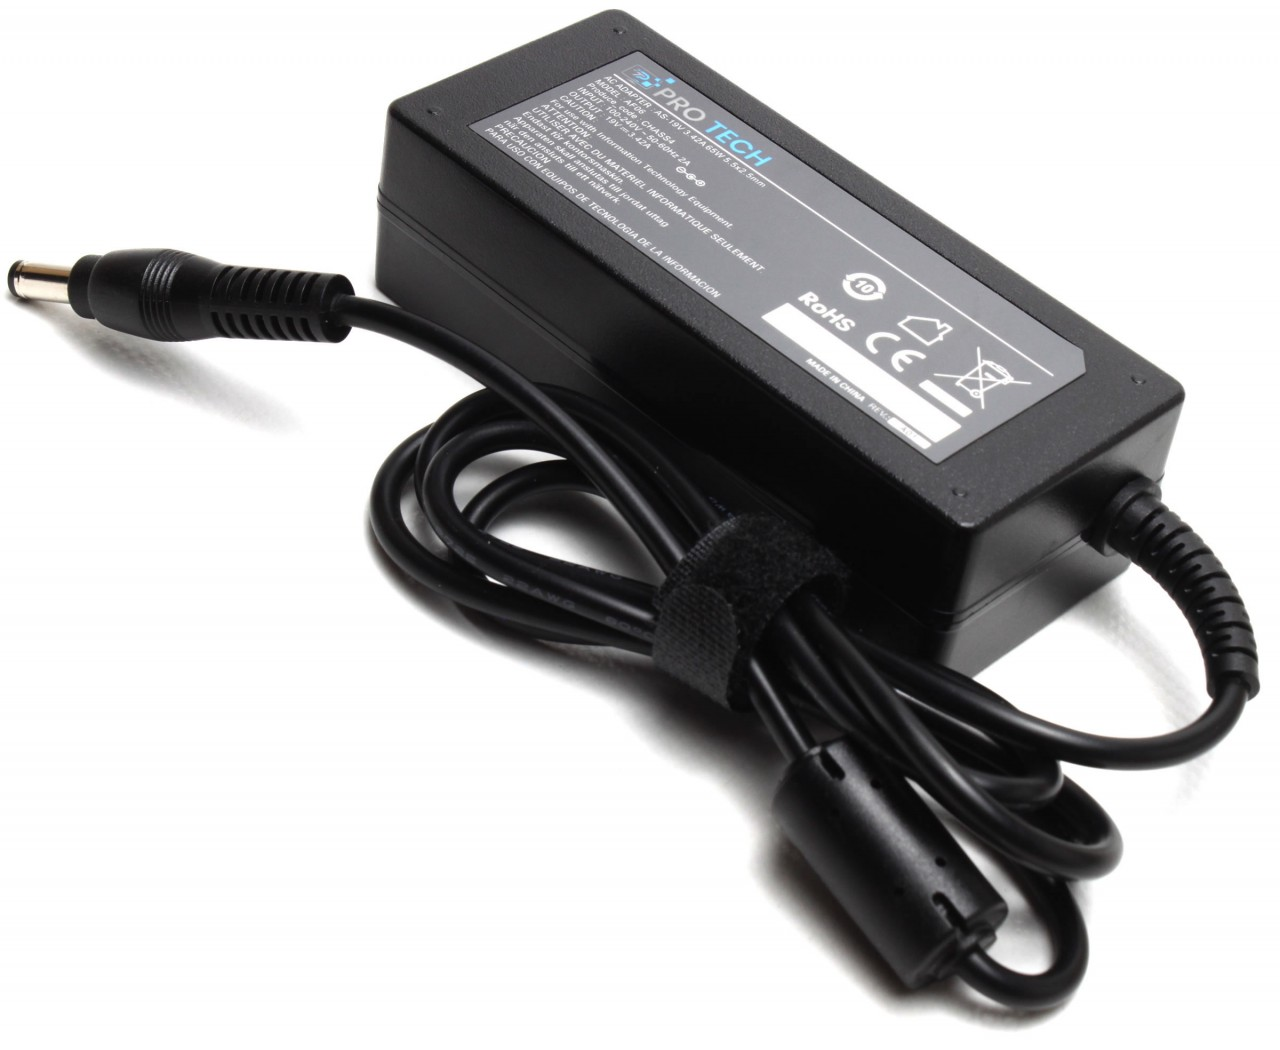 Incarcator MSI MS1682 Replacement imagine powerlaptop.ro 2021